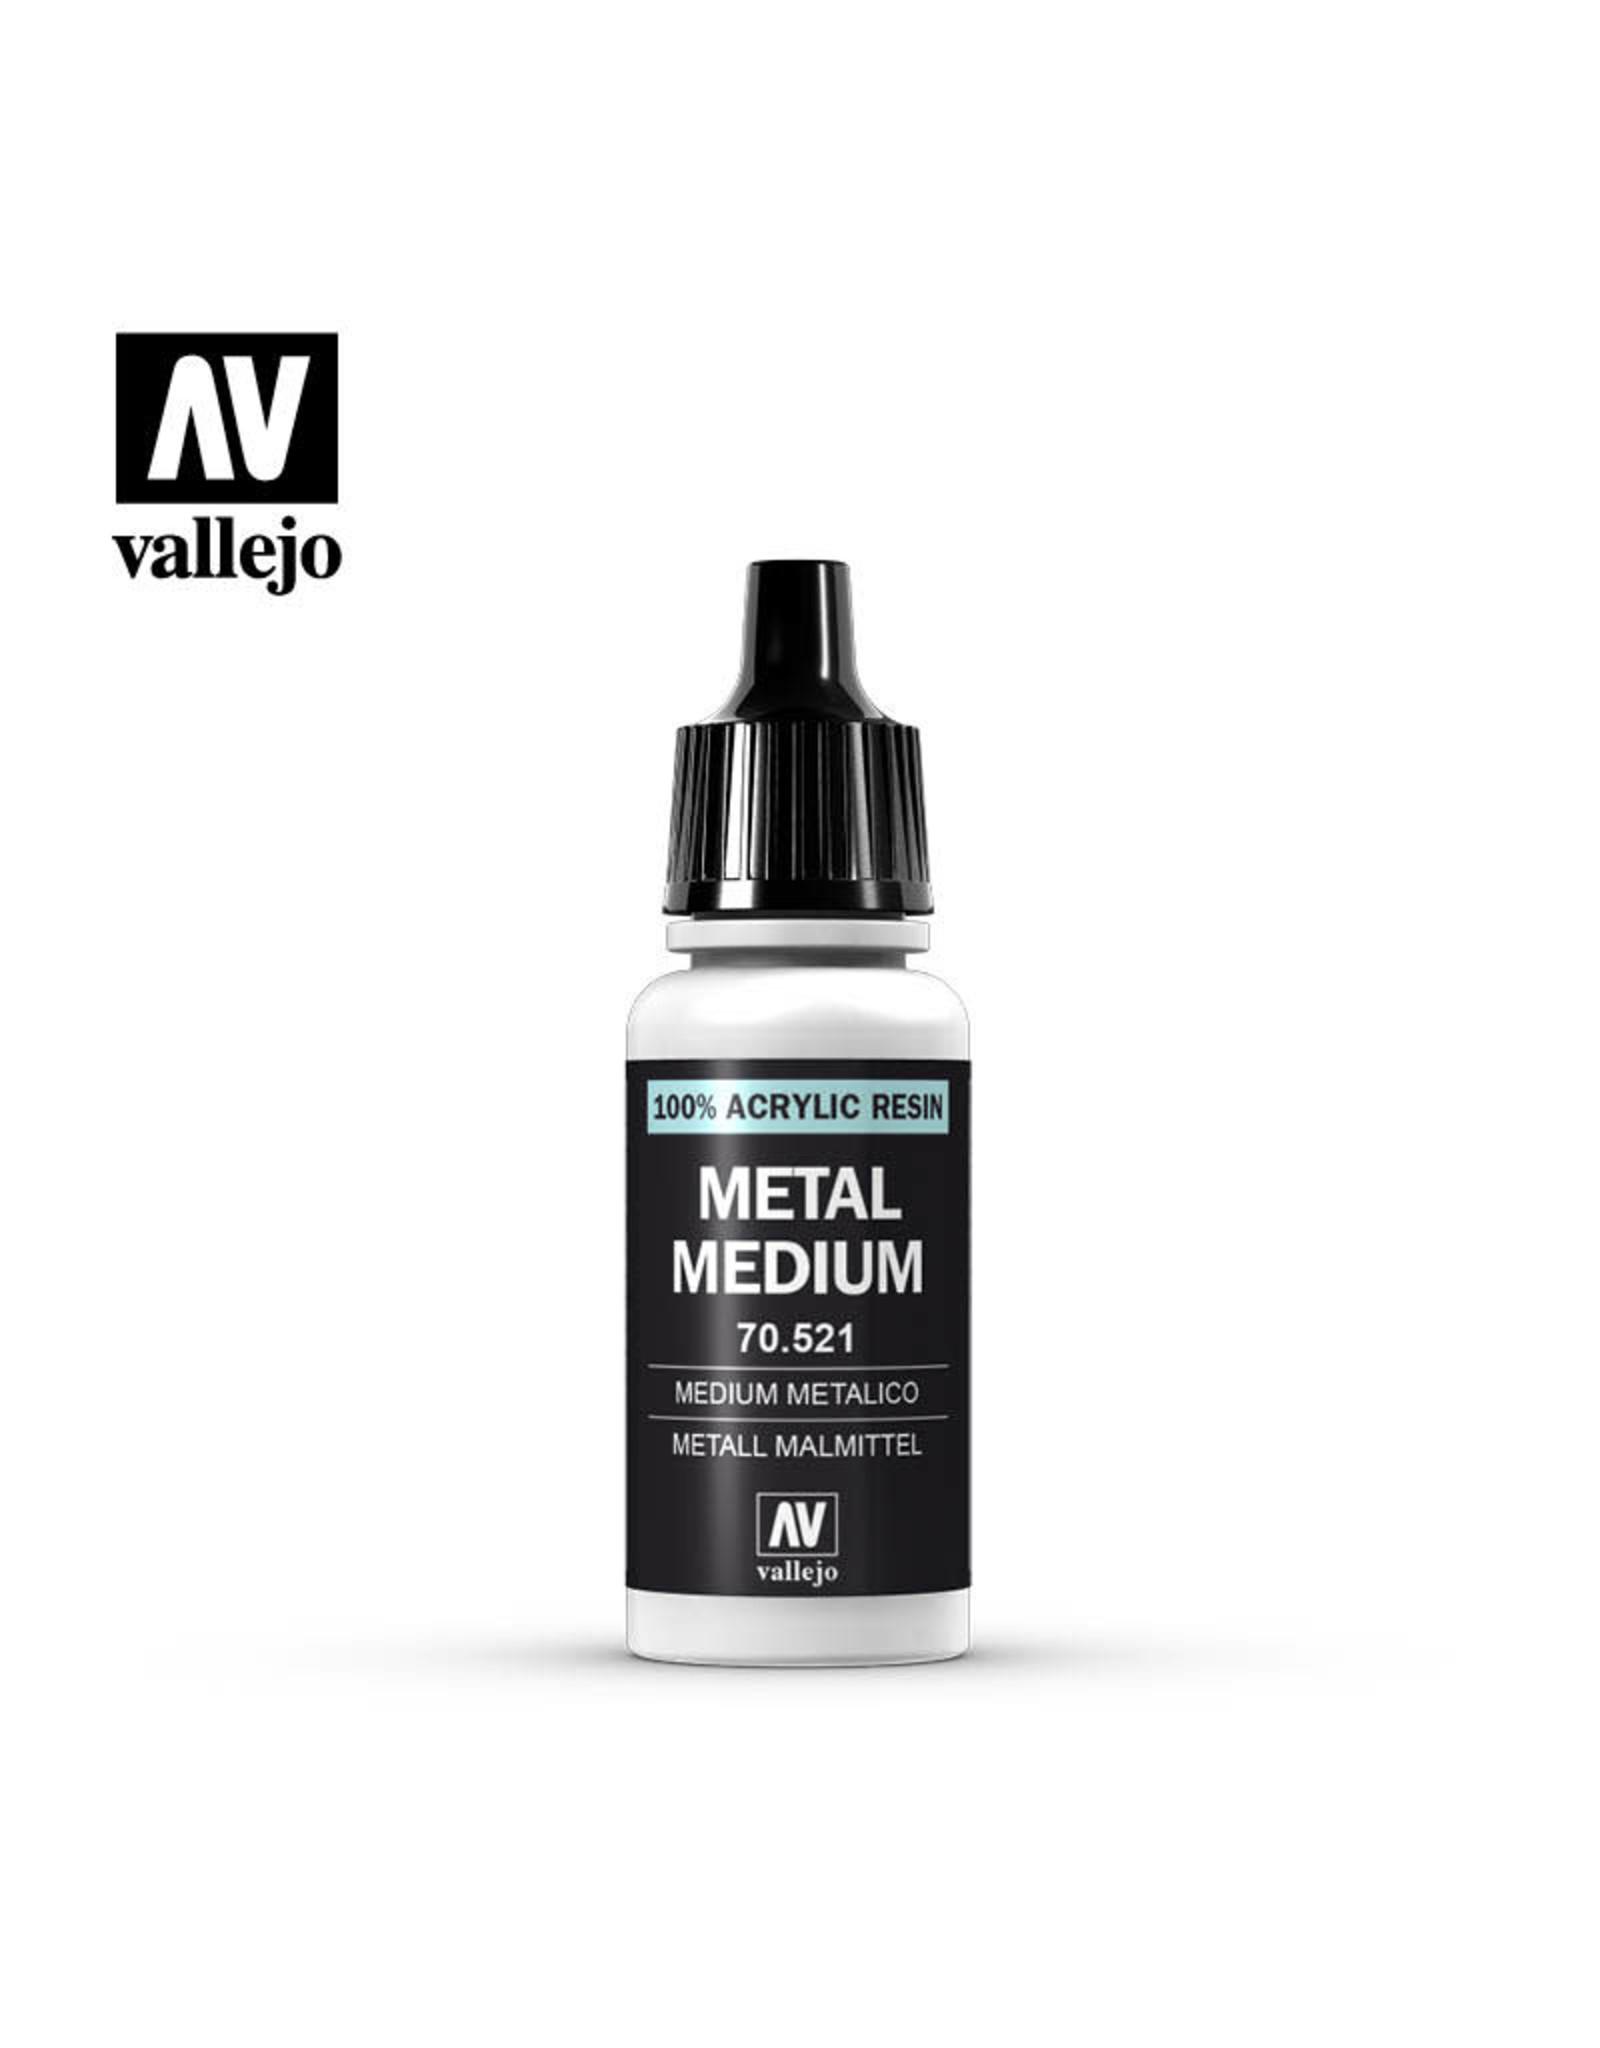 Vallejo Vallejo Paint: Metal Medium 70.521